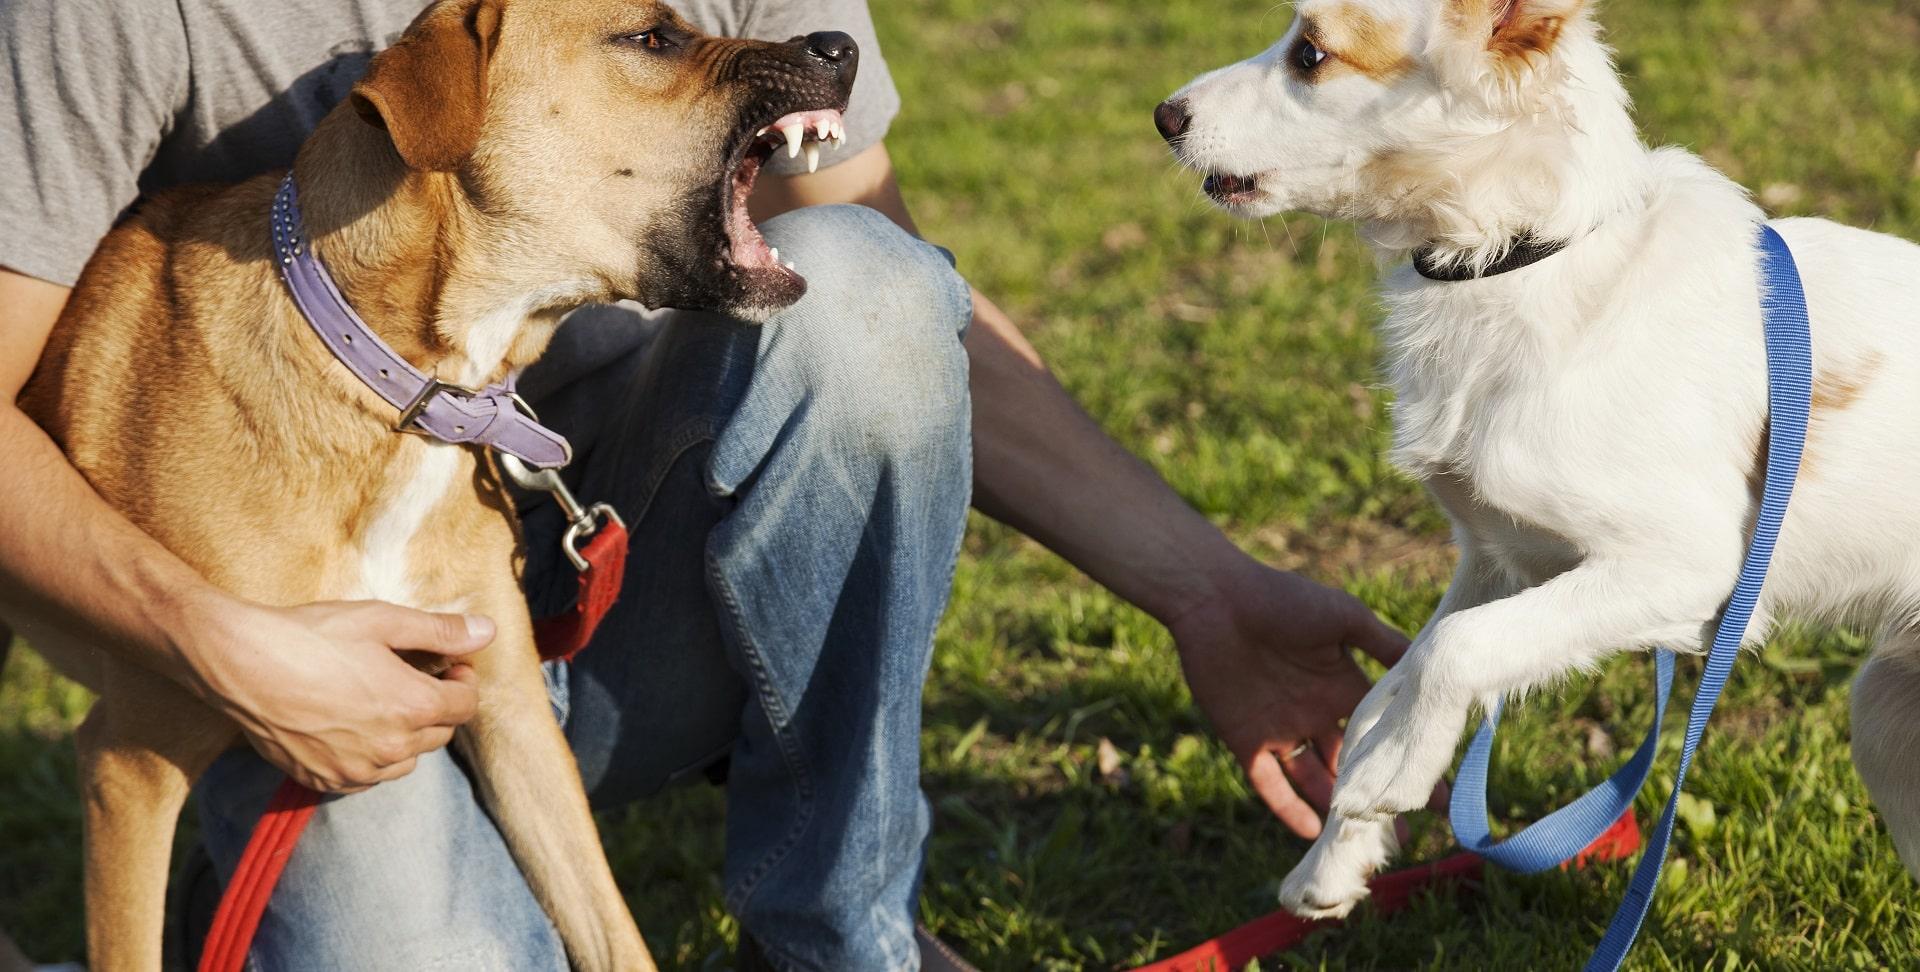 pies atakuje inne psy